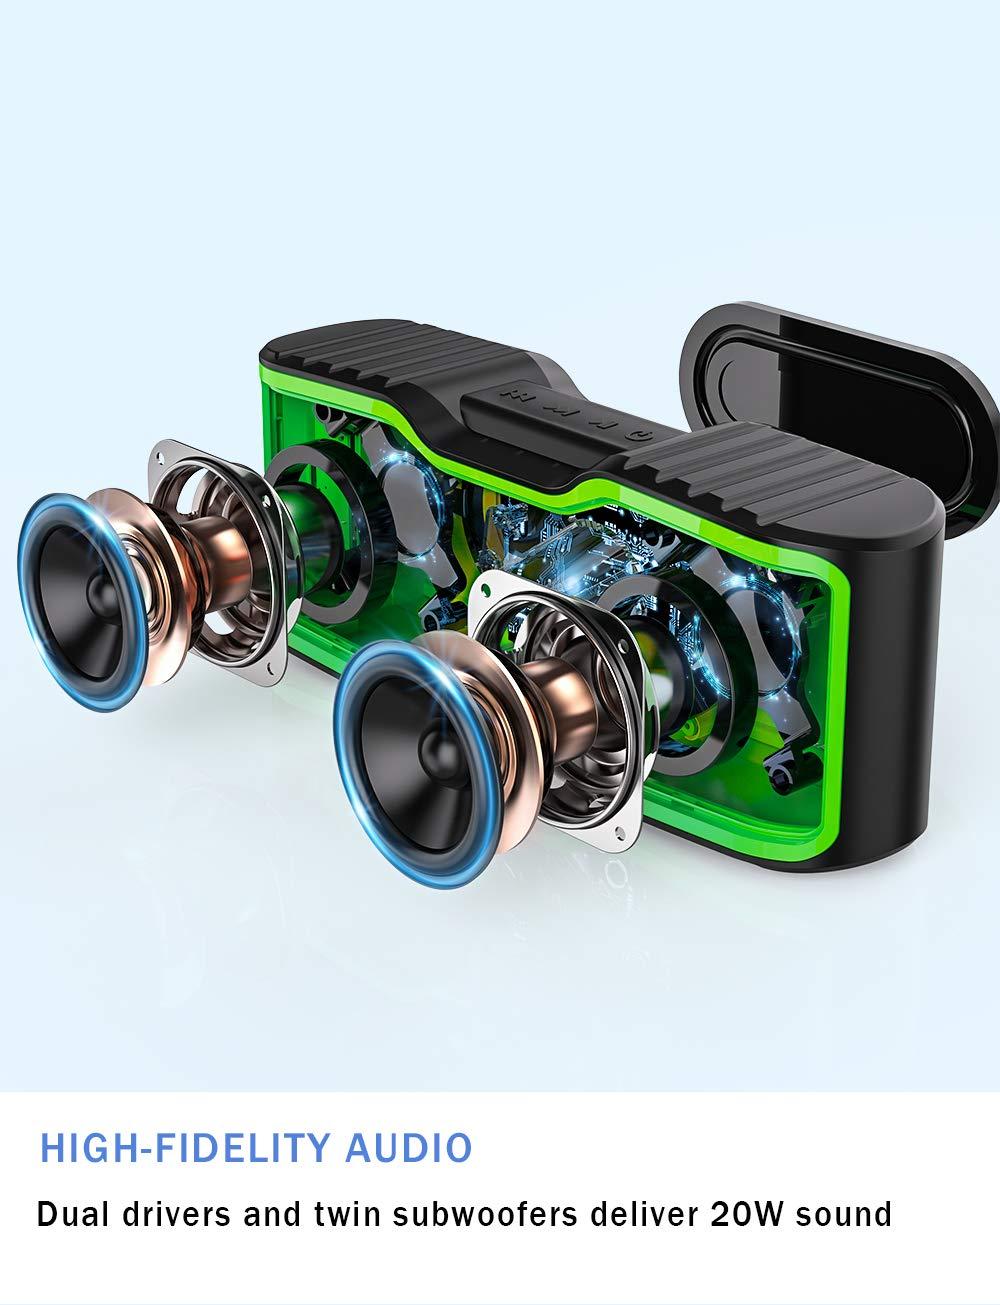 Built AOMAIS Sport II Mini Portable Bluetooth Speakers with 10W Superior Sound